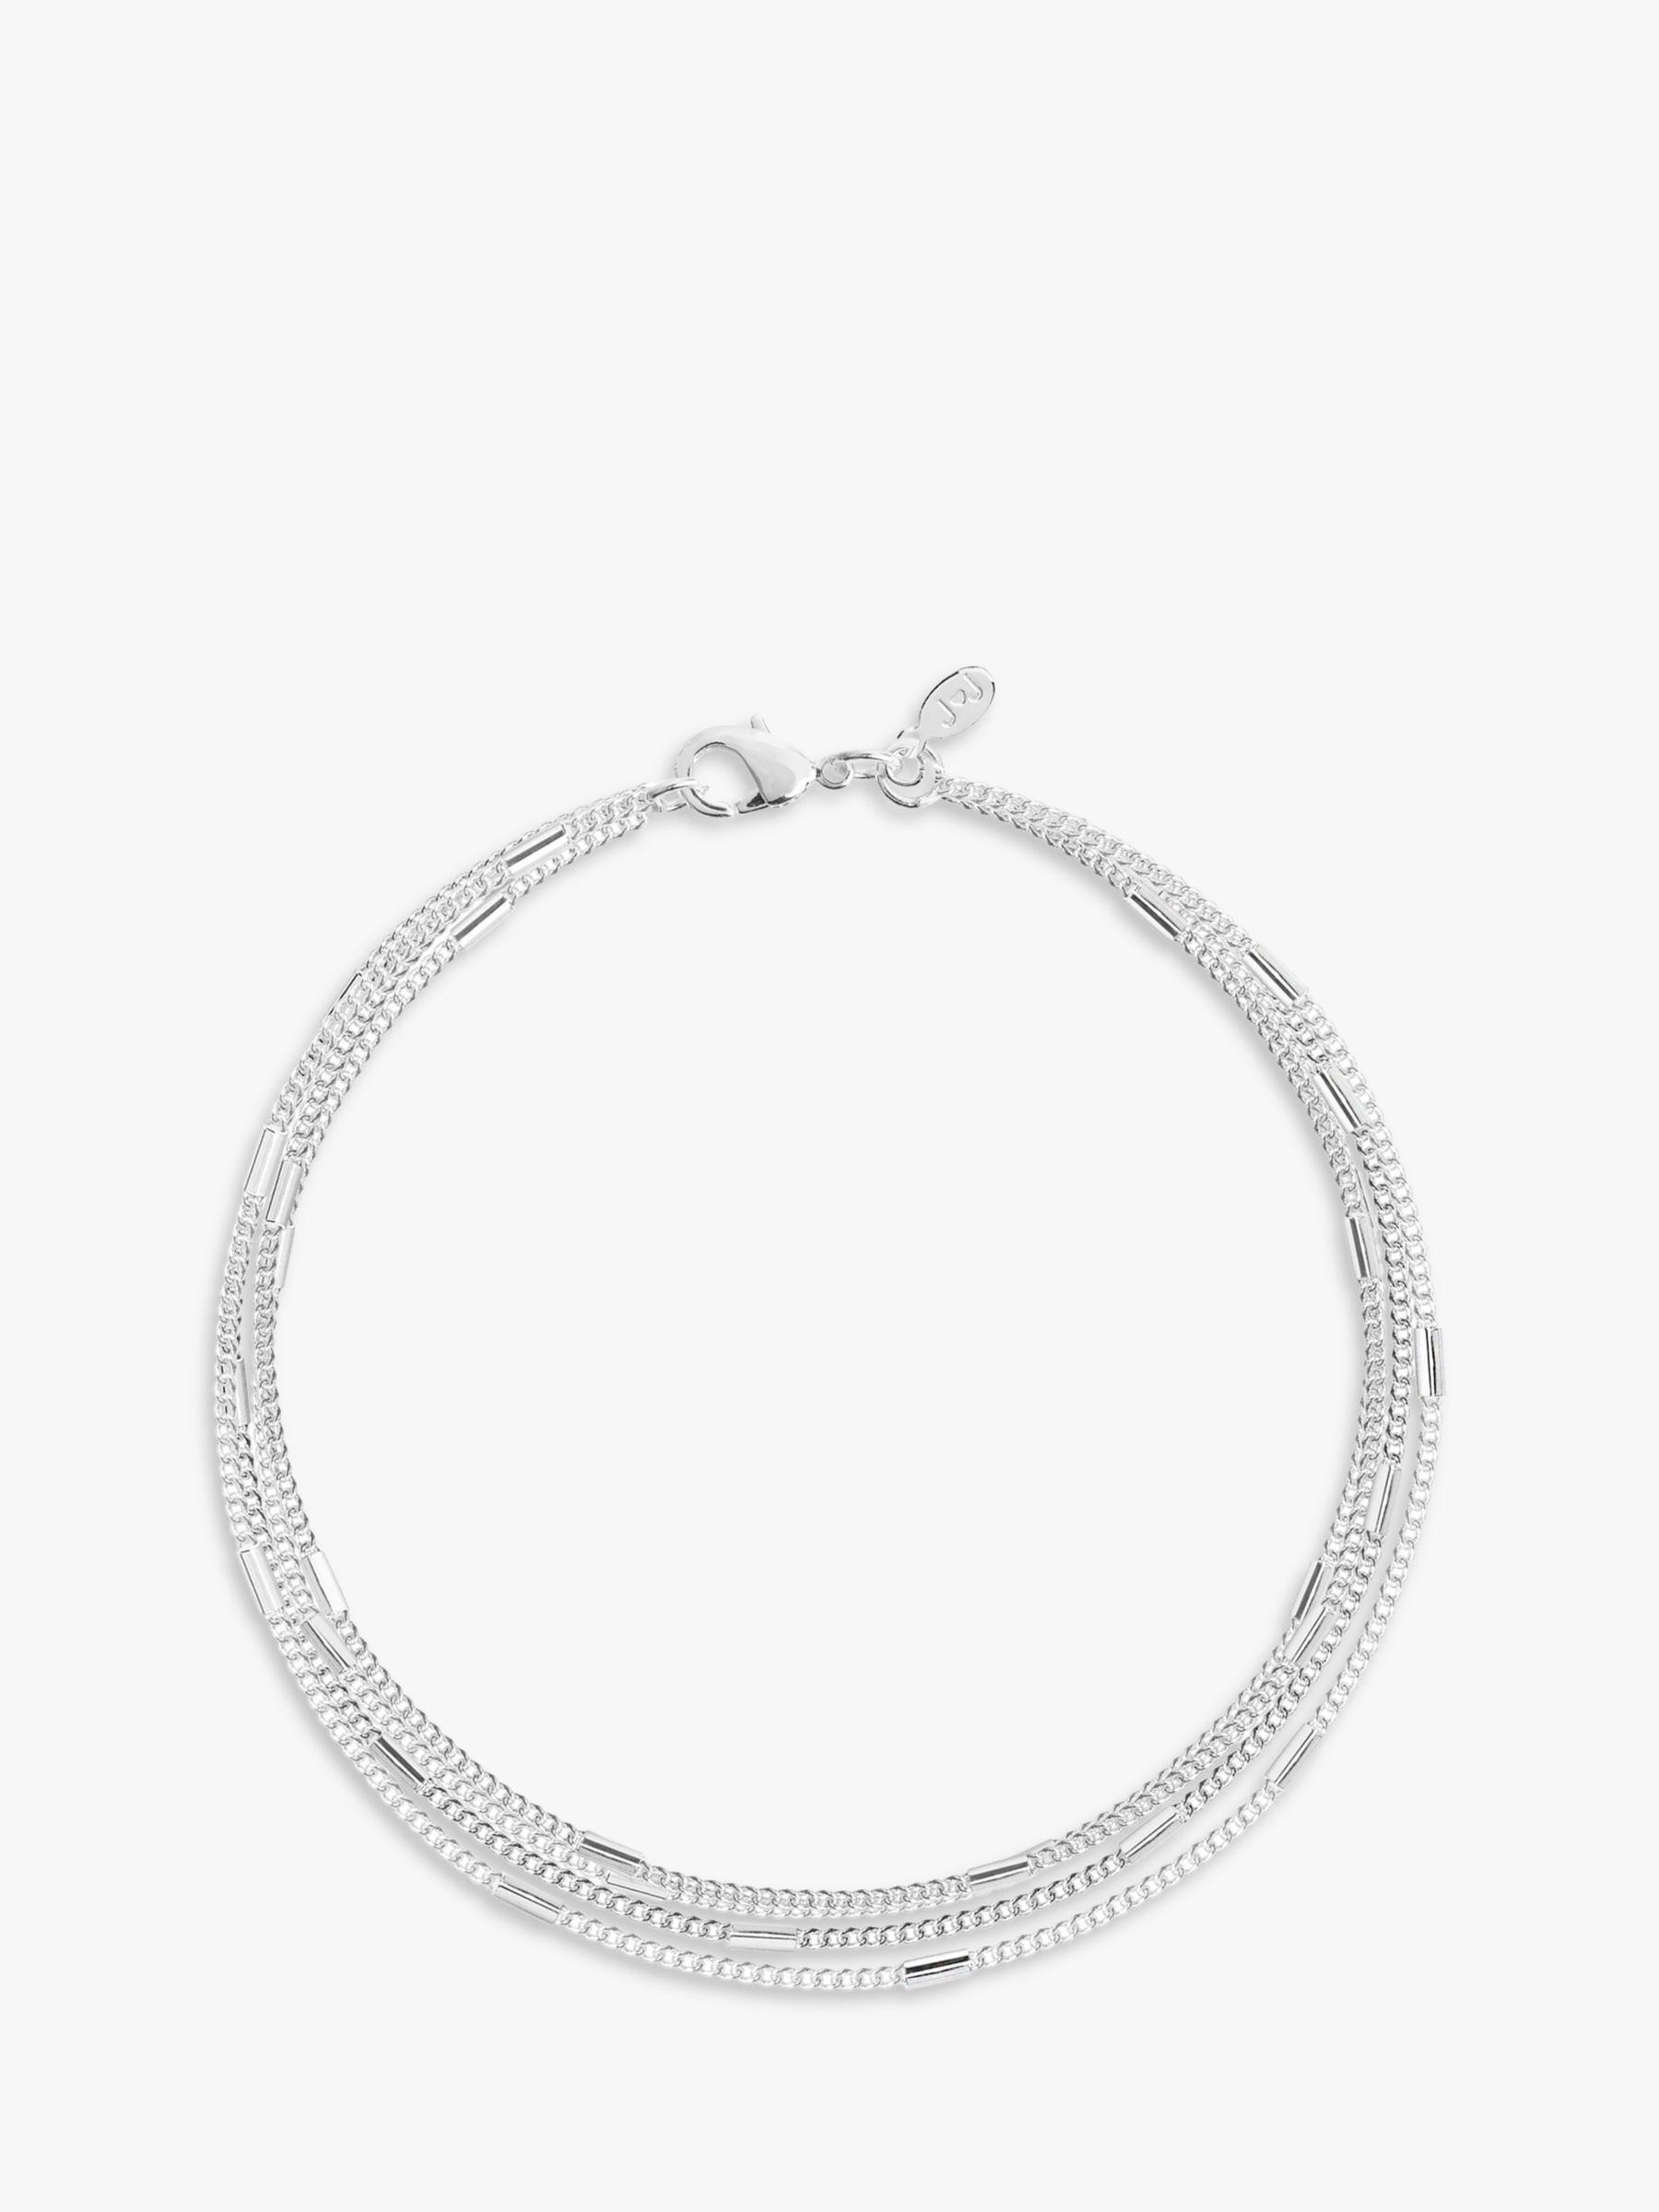 Joma Joma Layered Chain Bracelet, Silver